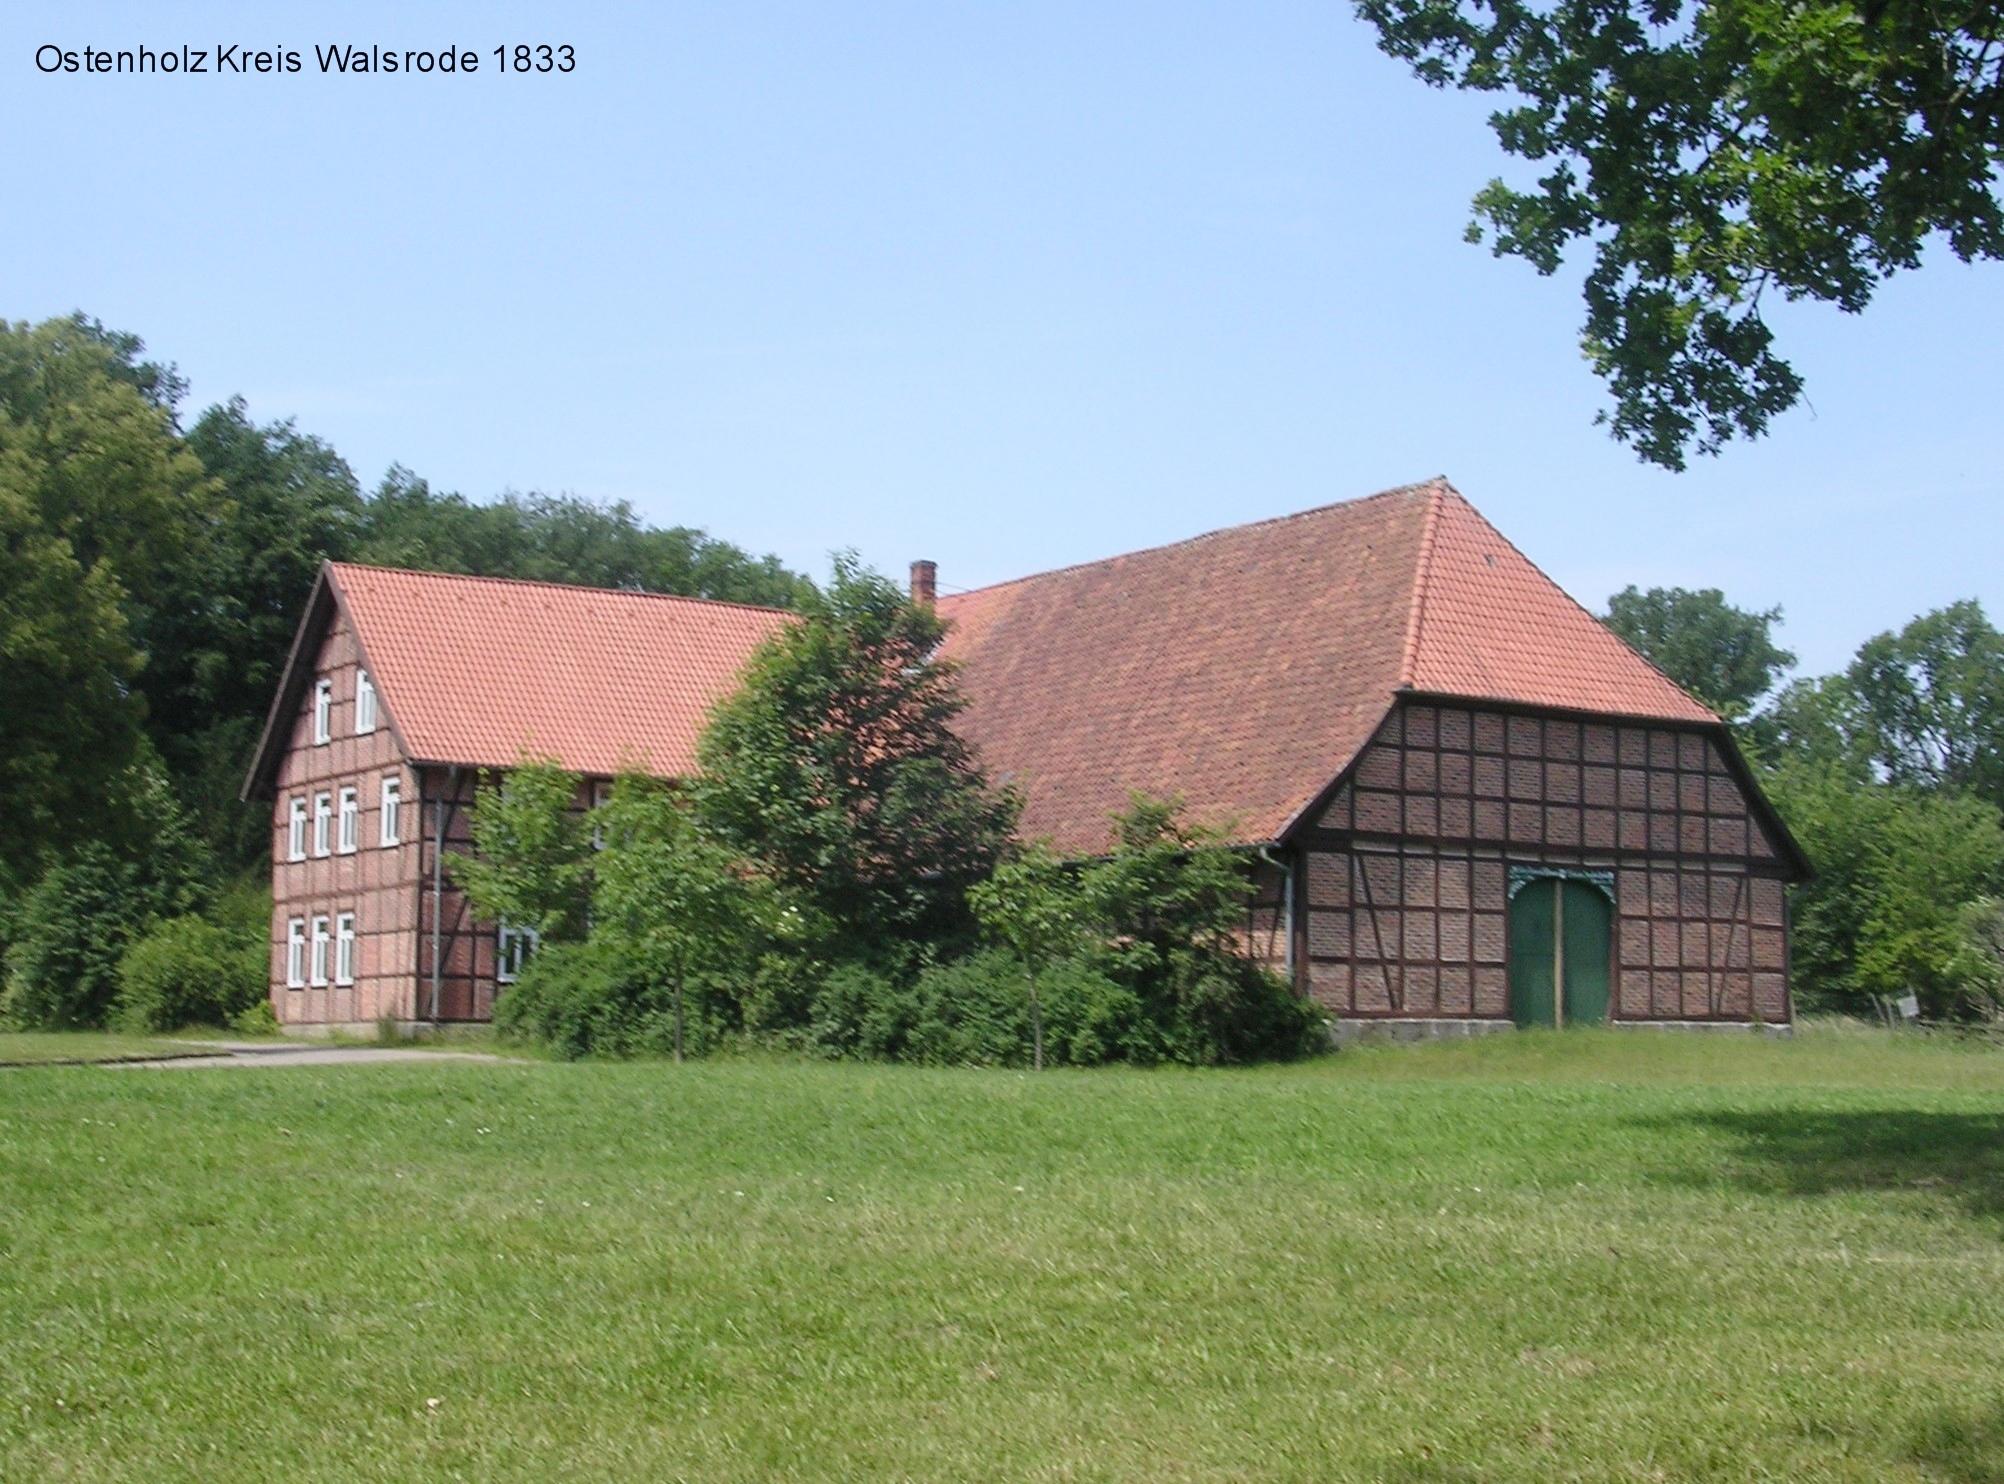 h-ostenholz-sfa-1833